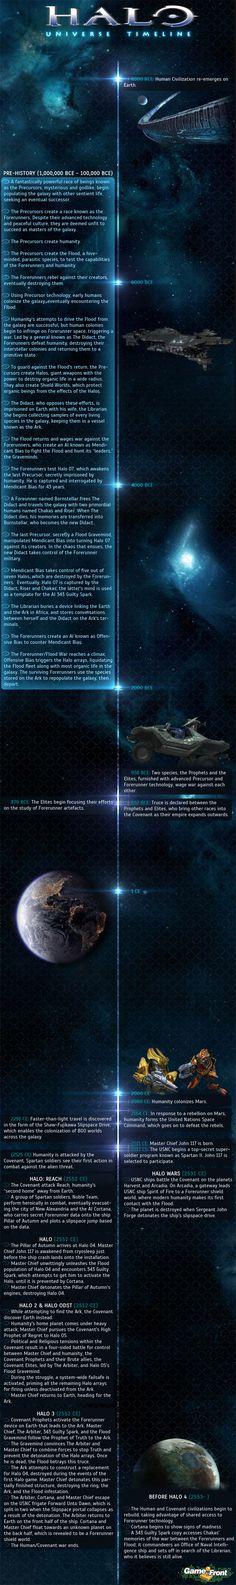 Halo Universe complete timeline